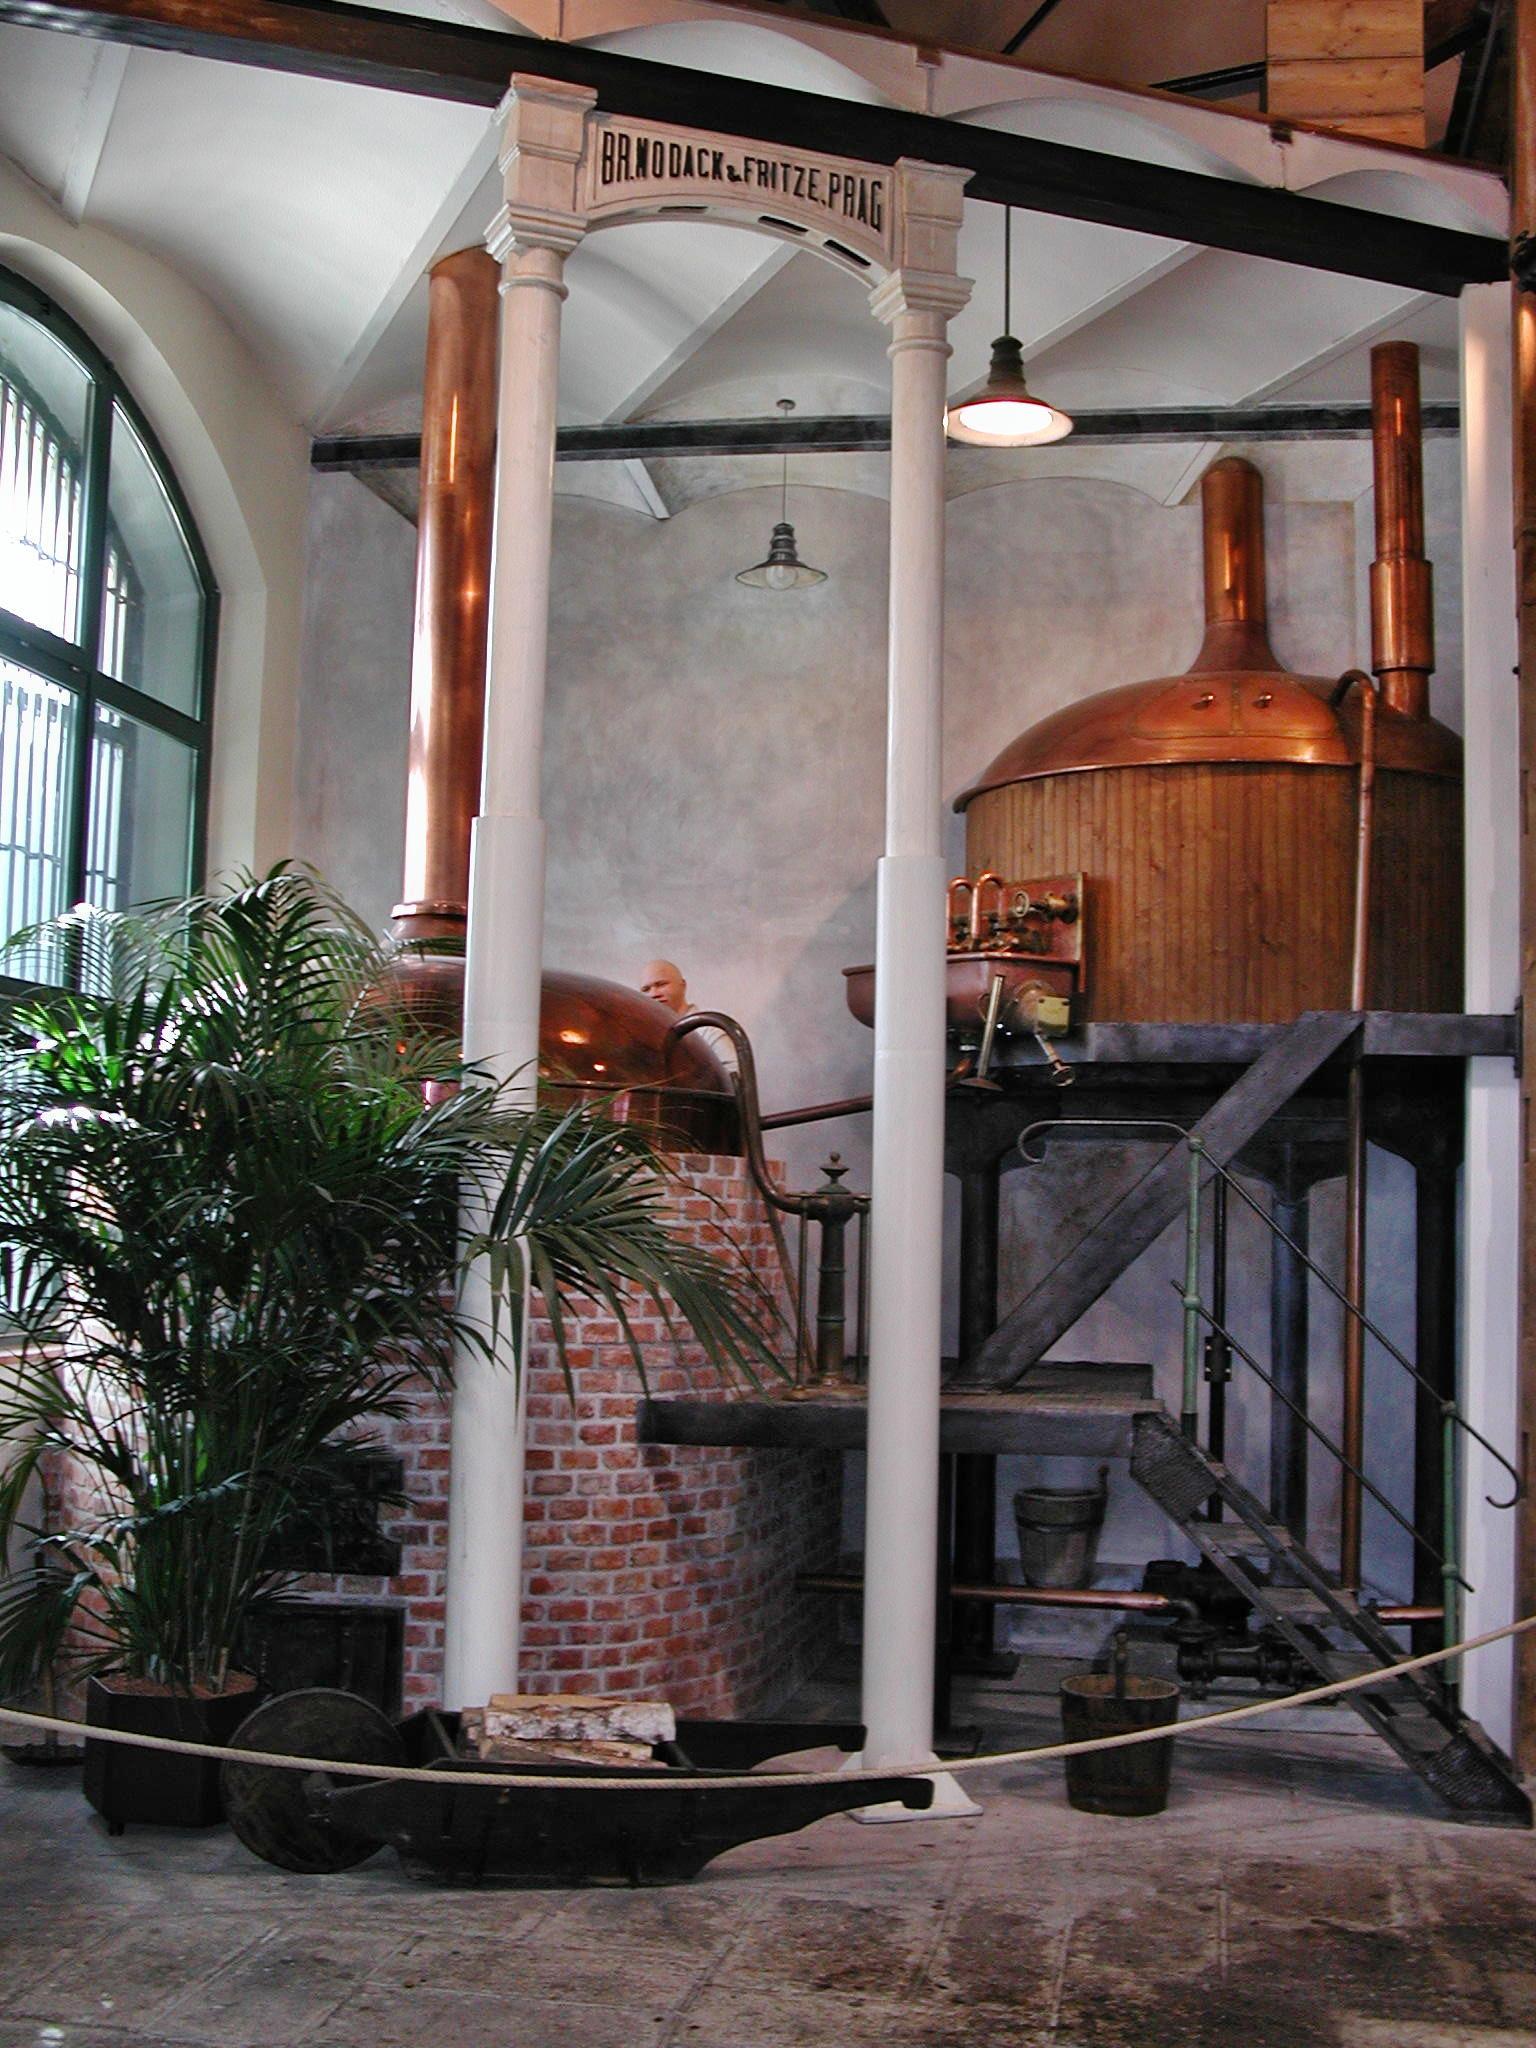 pilsener-brewery-3.jpeg